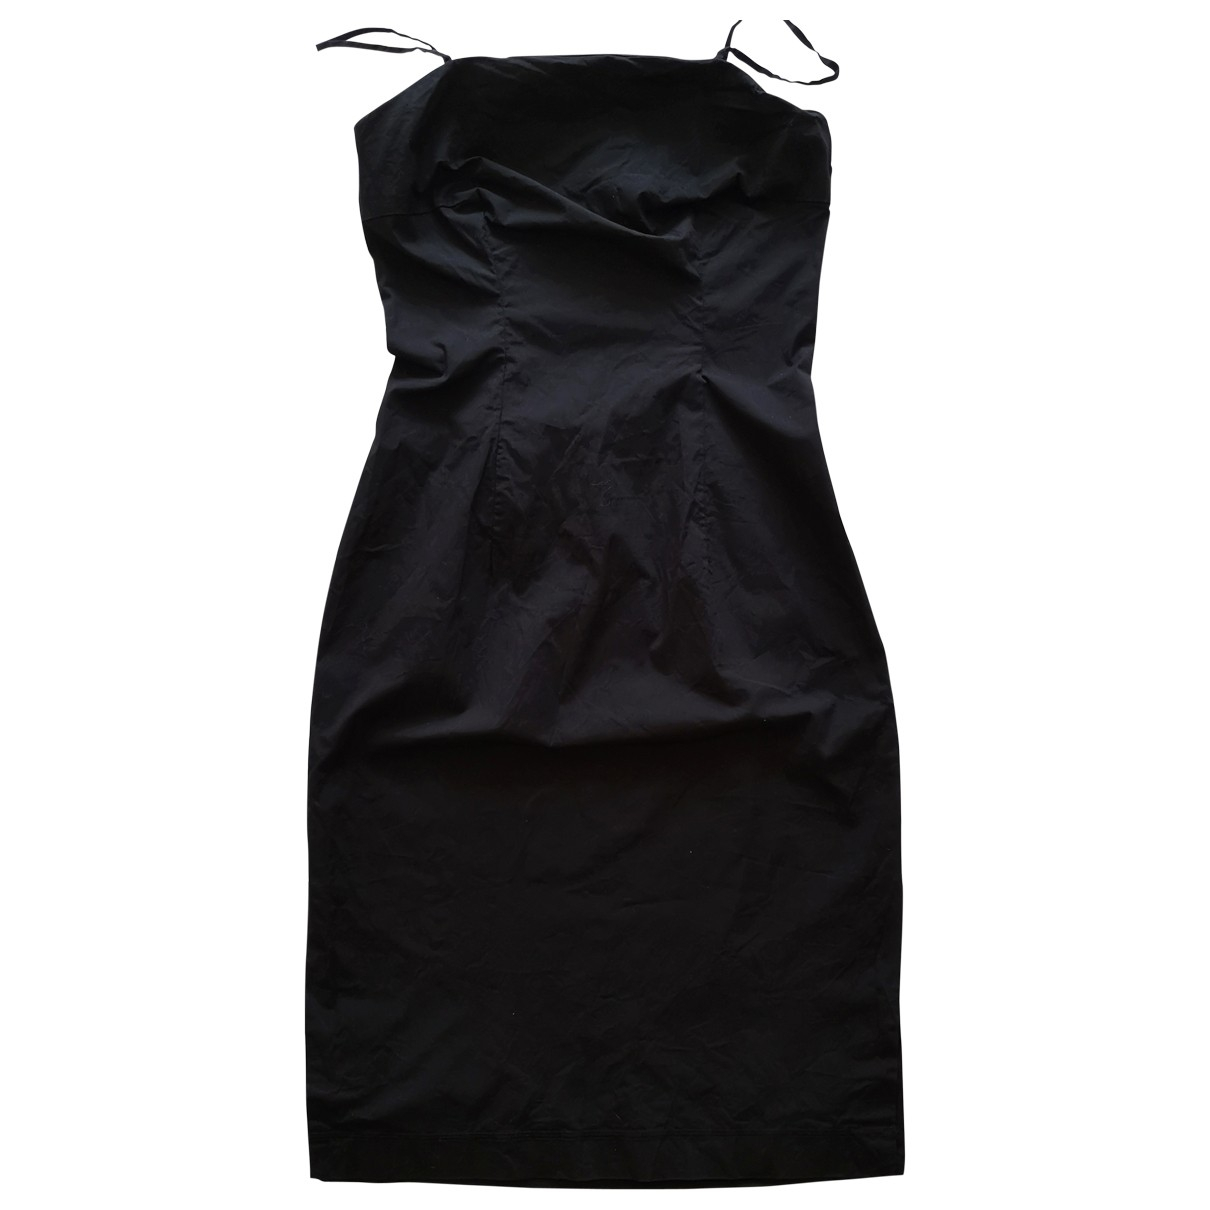 Tommy Hilfiger \N Black Cotton dress for Women 10 US